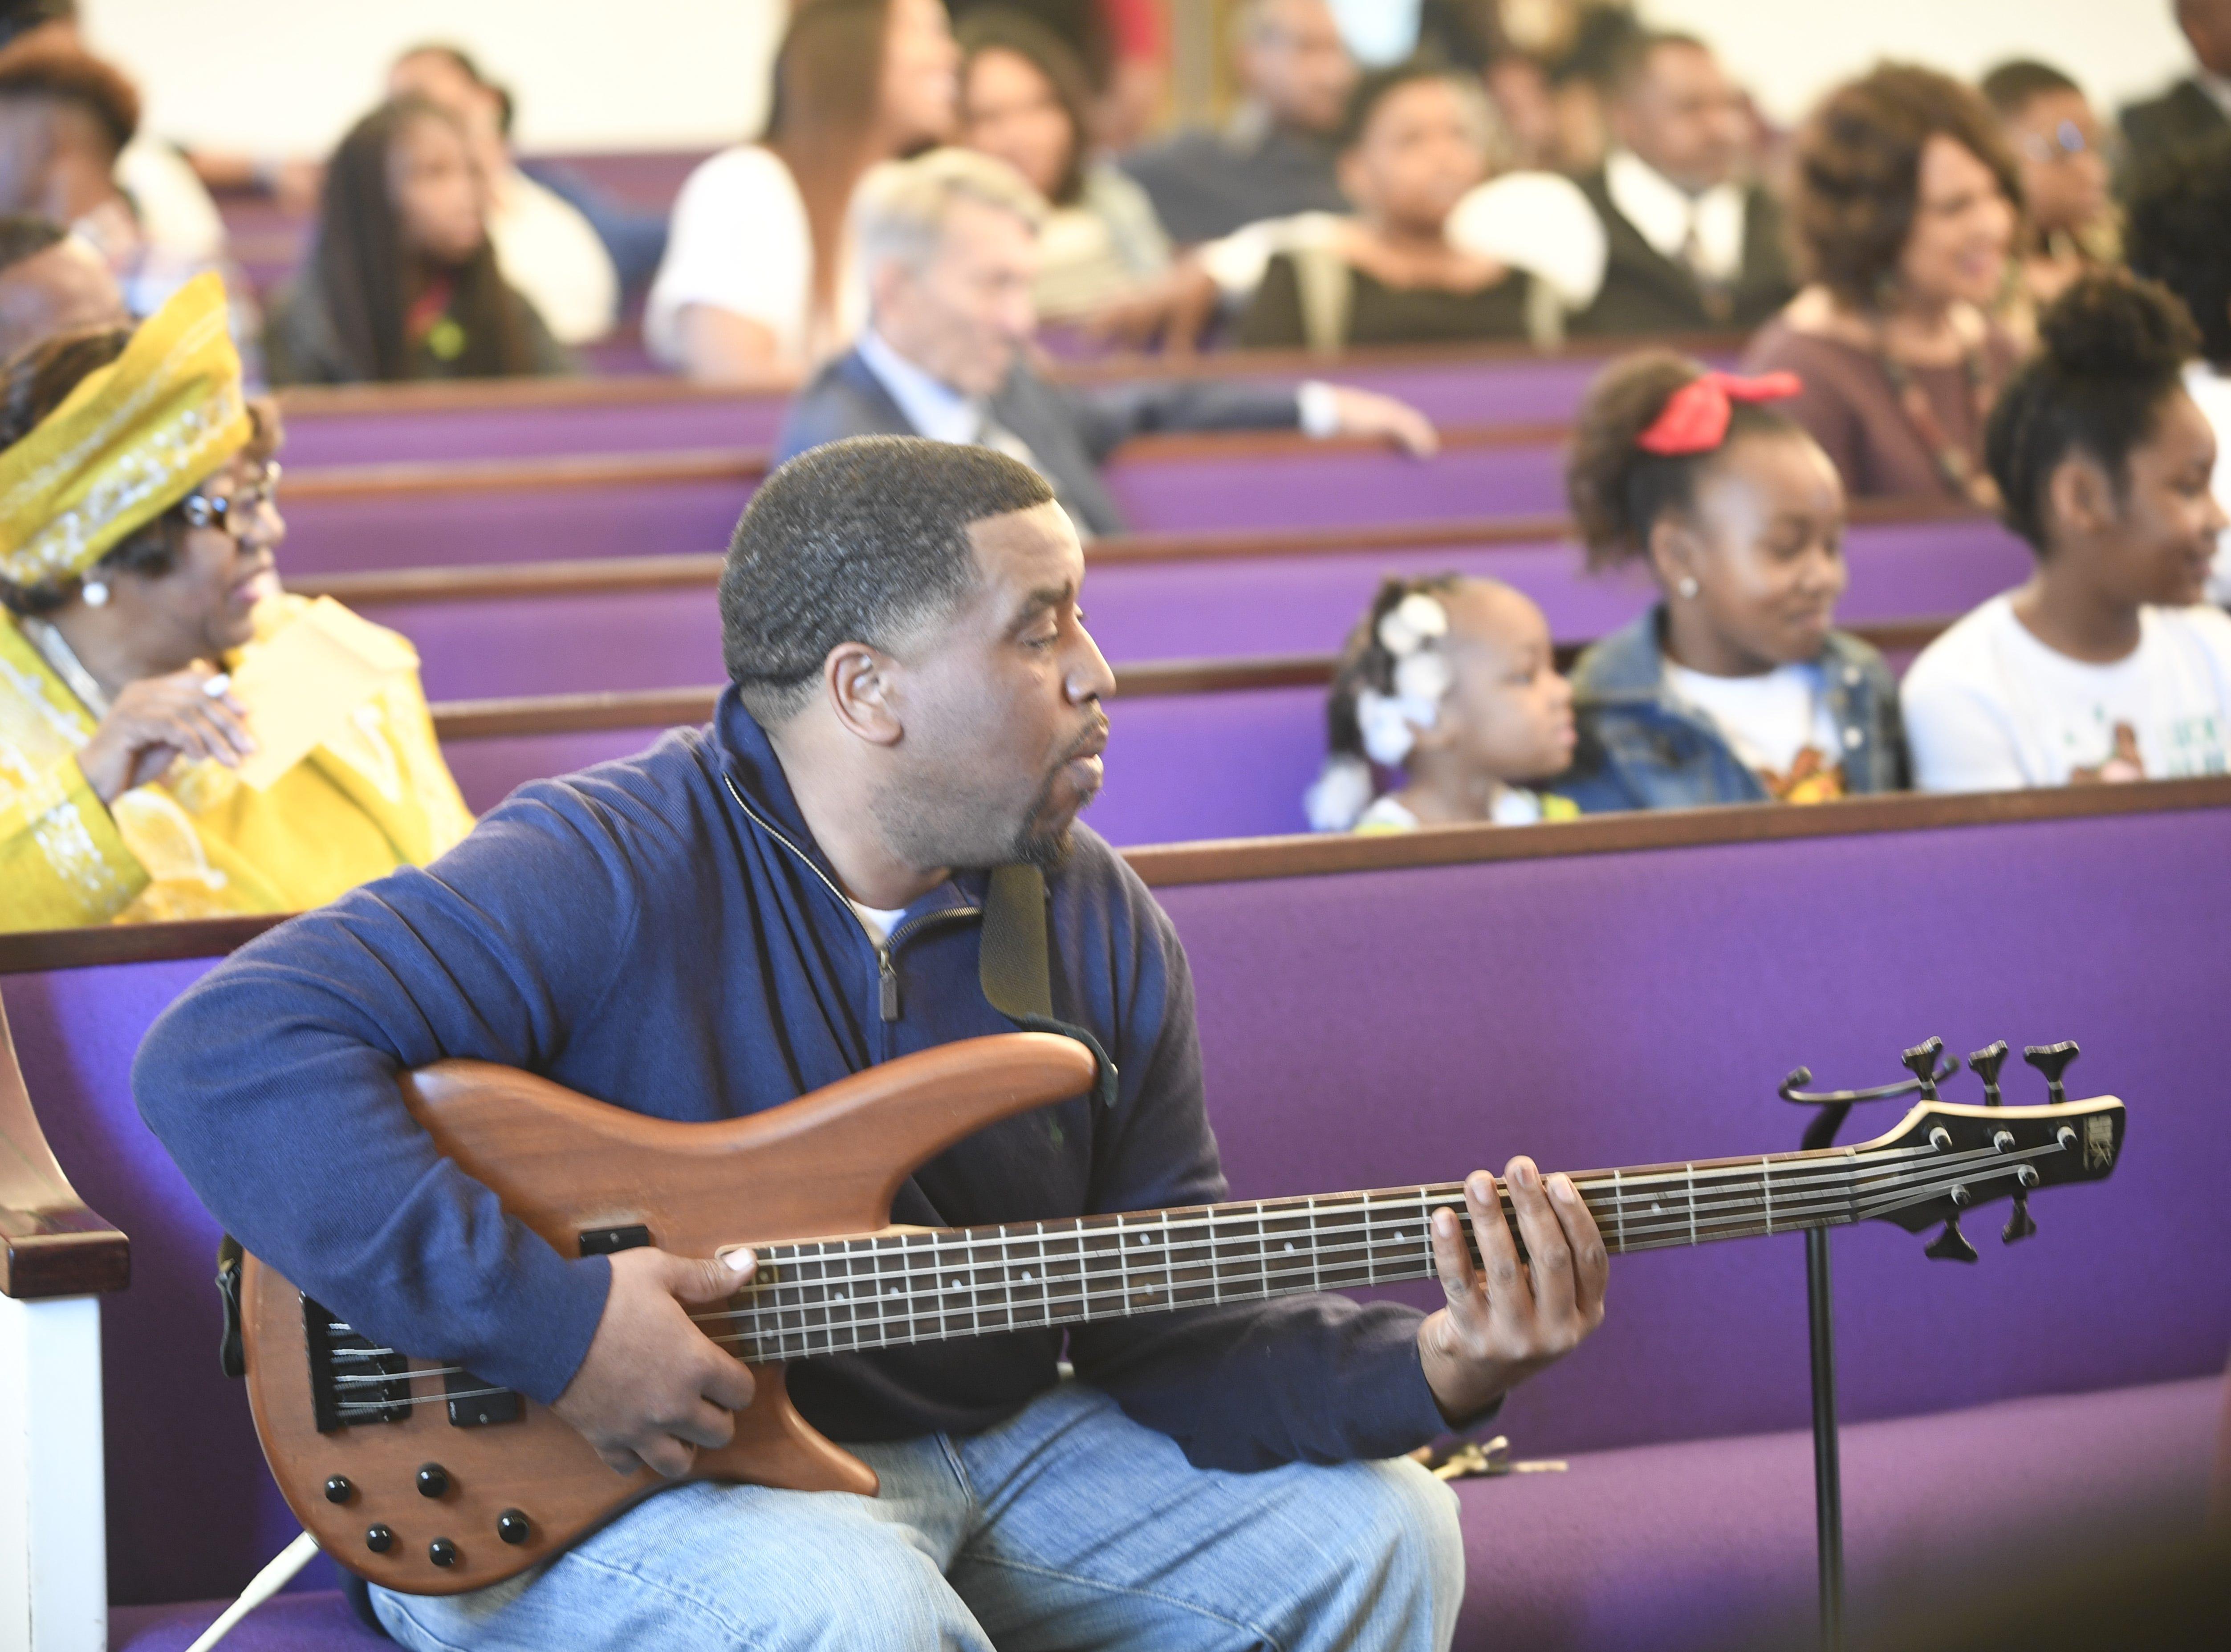 Darren Franklin plays the guitar for Mt. Pleasant Church during their Black History Month event, in Pinson, Tenn. Feb 24, 2019.